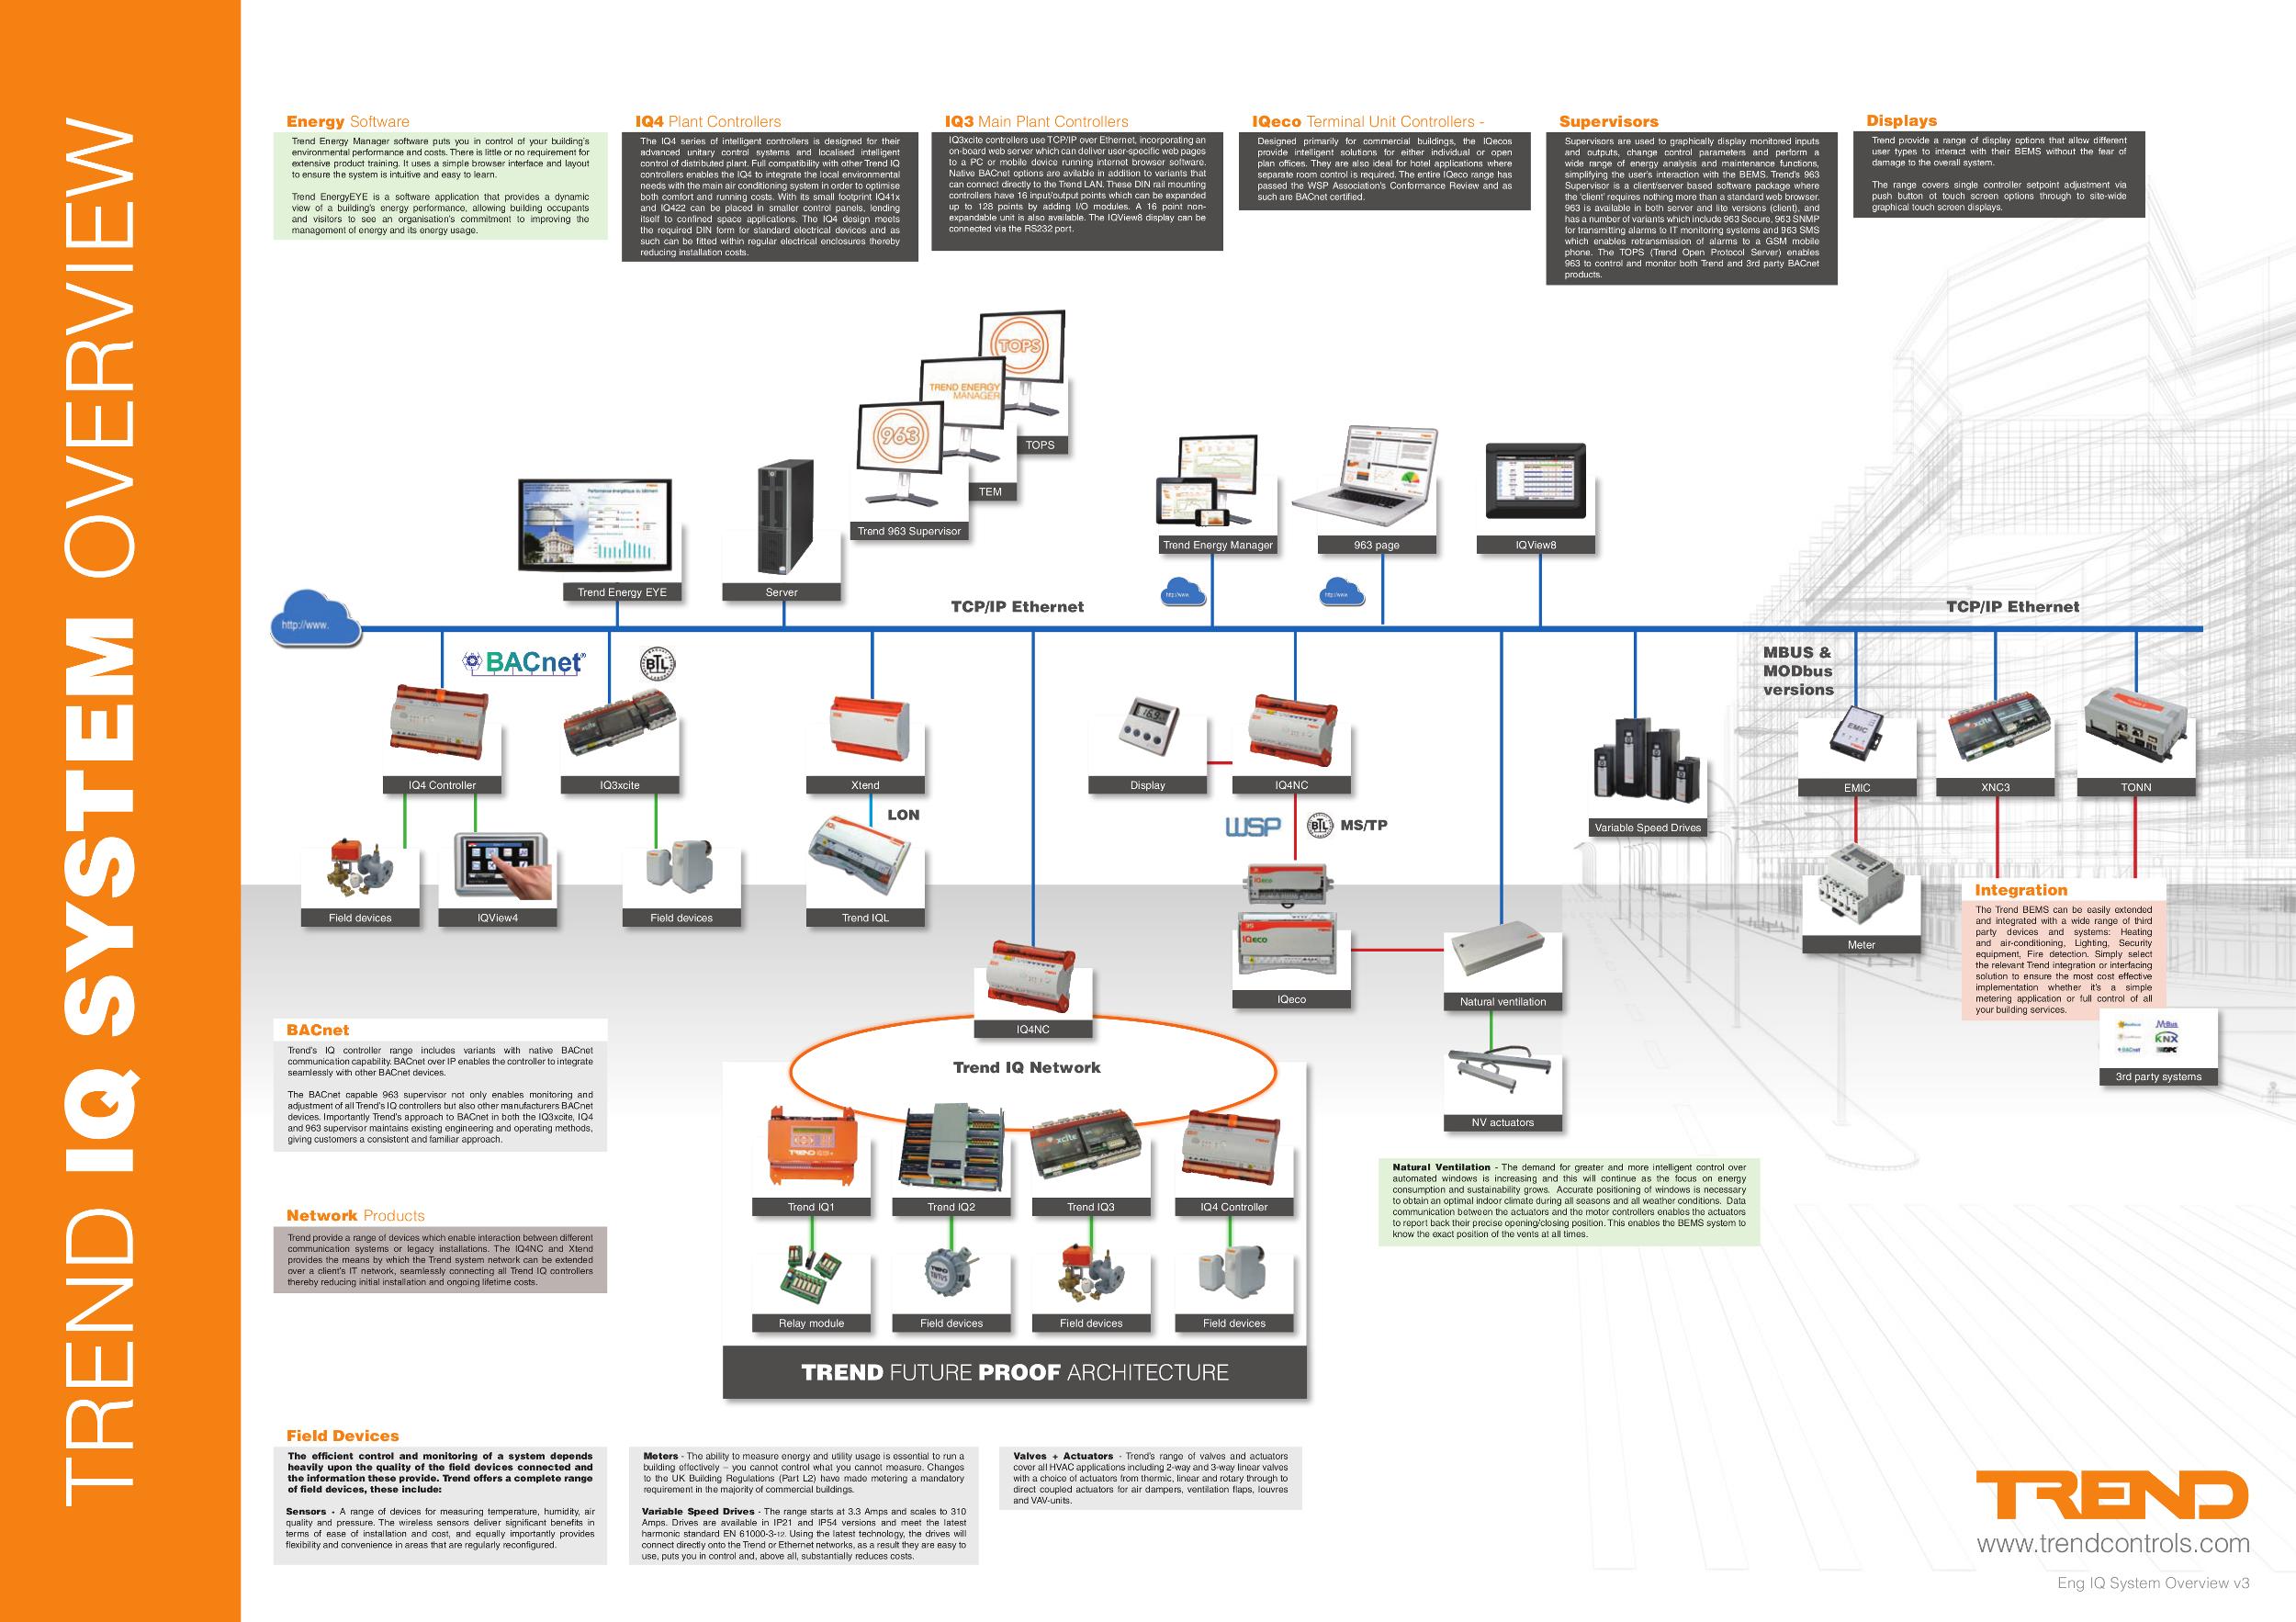 NE_4019] Building Management System Wiring Diagram Free DiagramElae Inoma Mopar Wedab Wigeg Mohammedshrine Librar Wiring 101